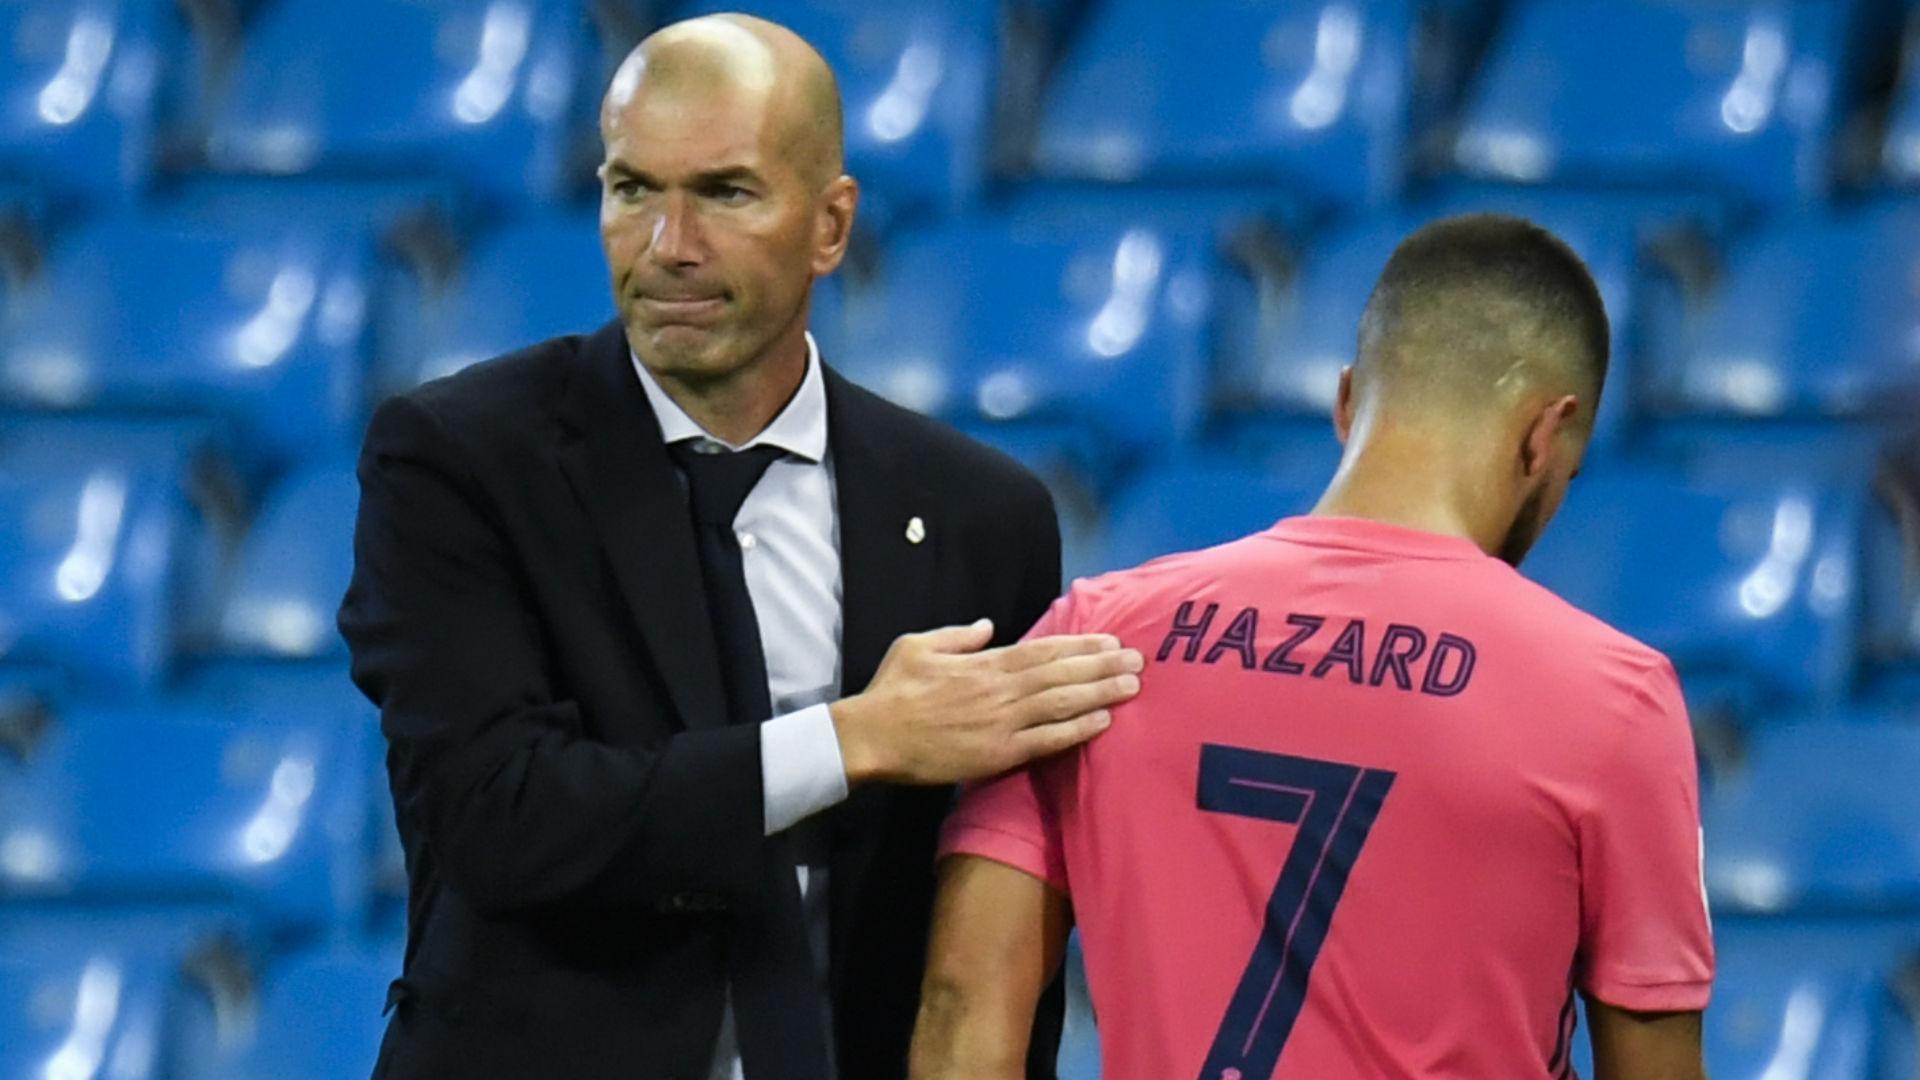 Zinedine-zidane-eden-hazard-real-madrid_1ftsia3nq5i721f0otresmatrc